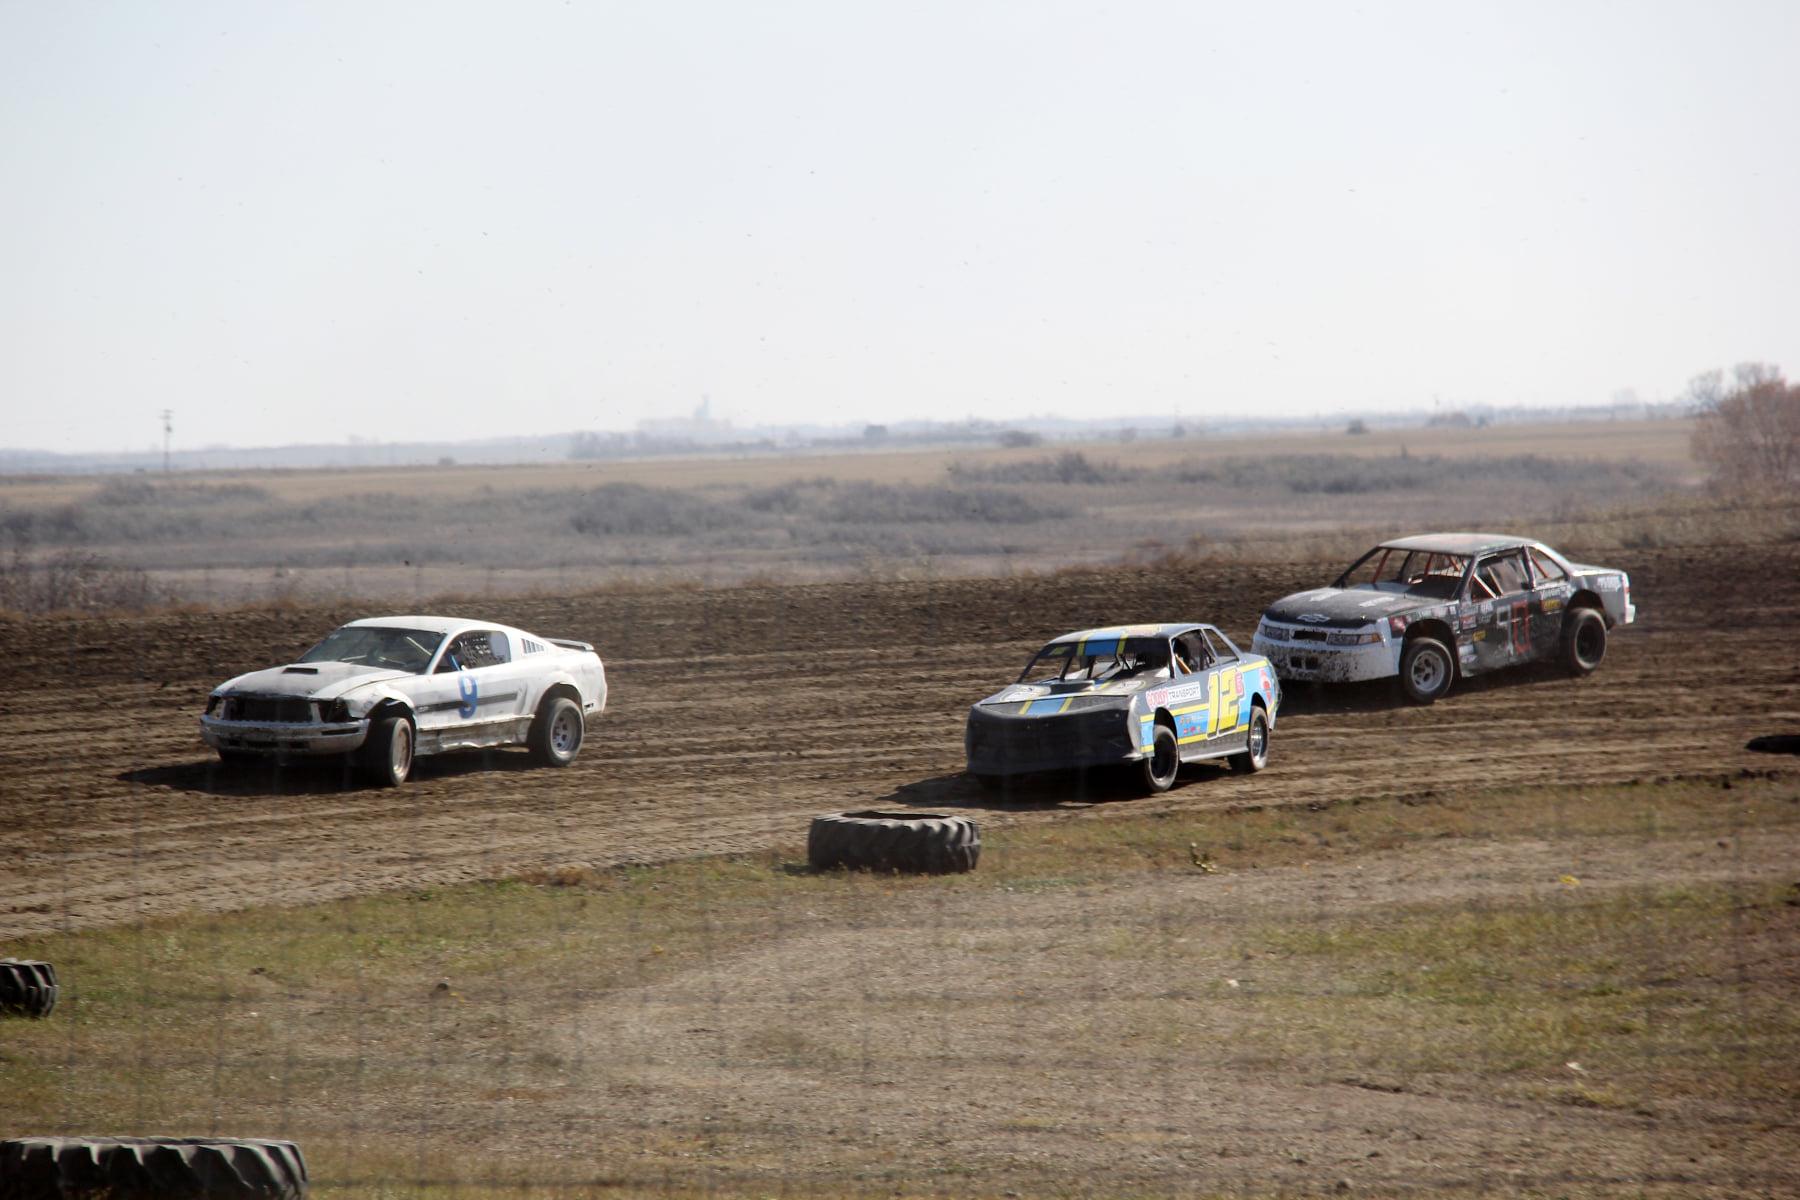 Outlook_Racing_Kemmer_Racing_Photography_5.jpg